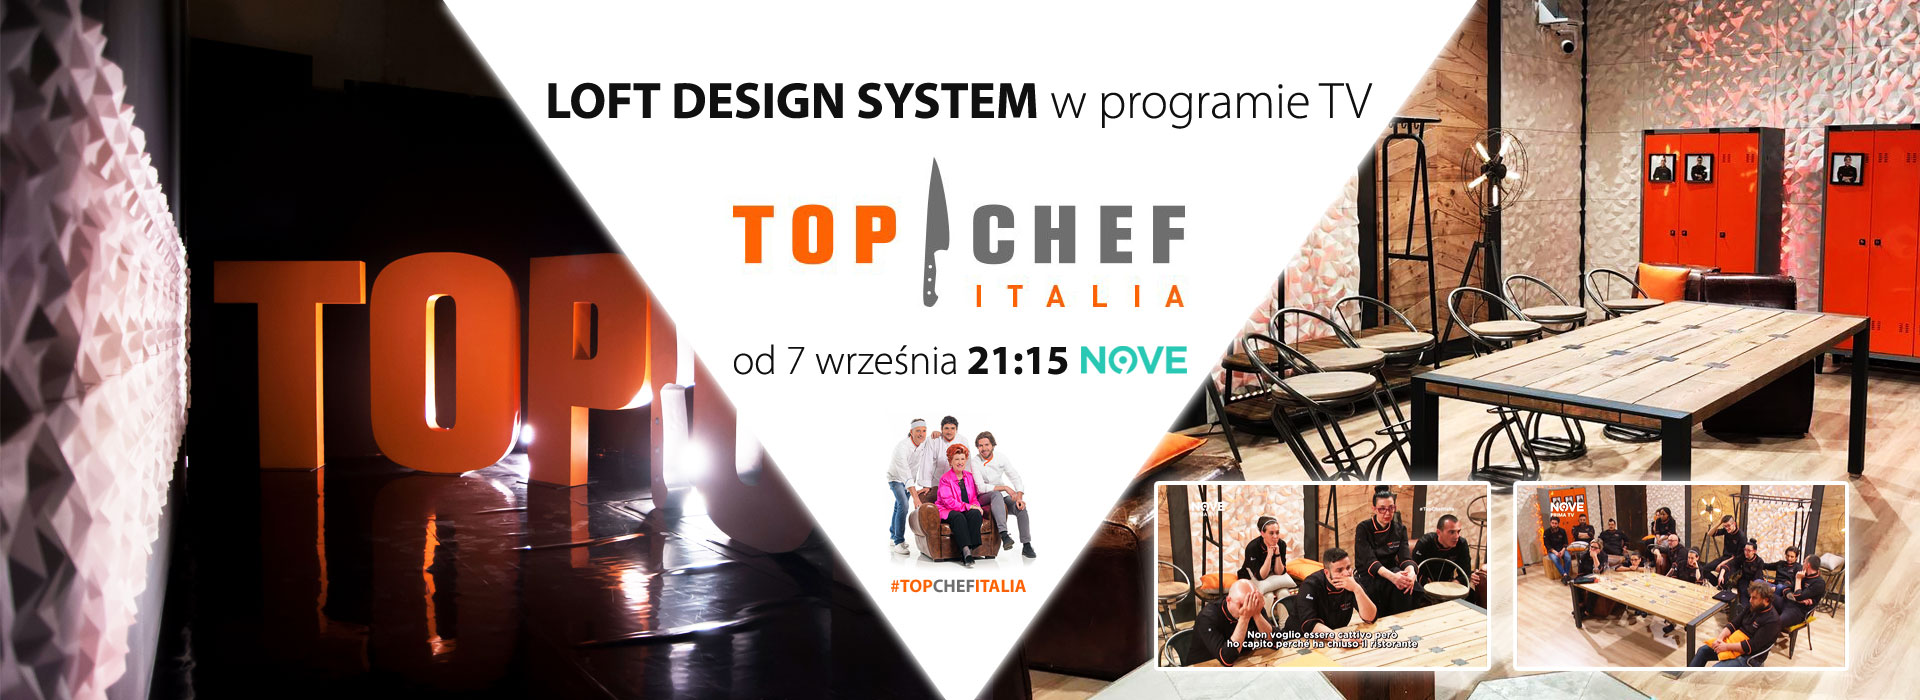 Top_Chef_italia_panele_dekoracyjne_loft_system